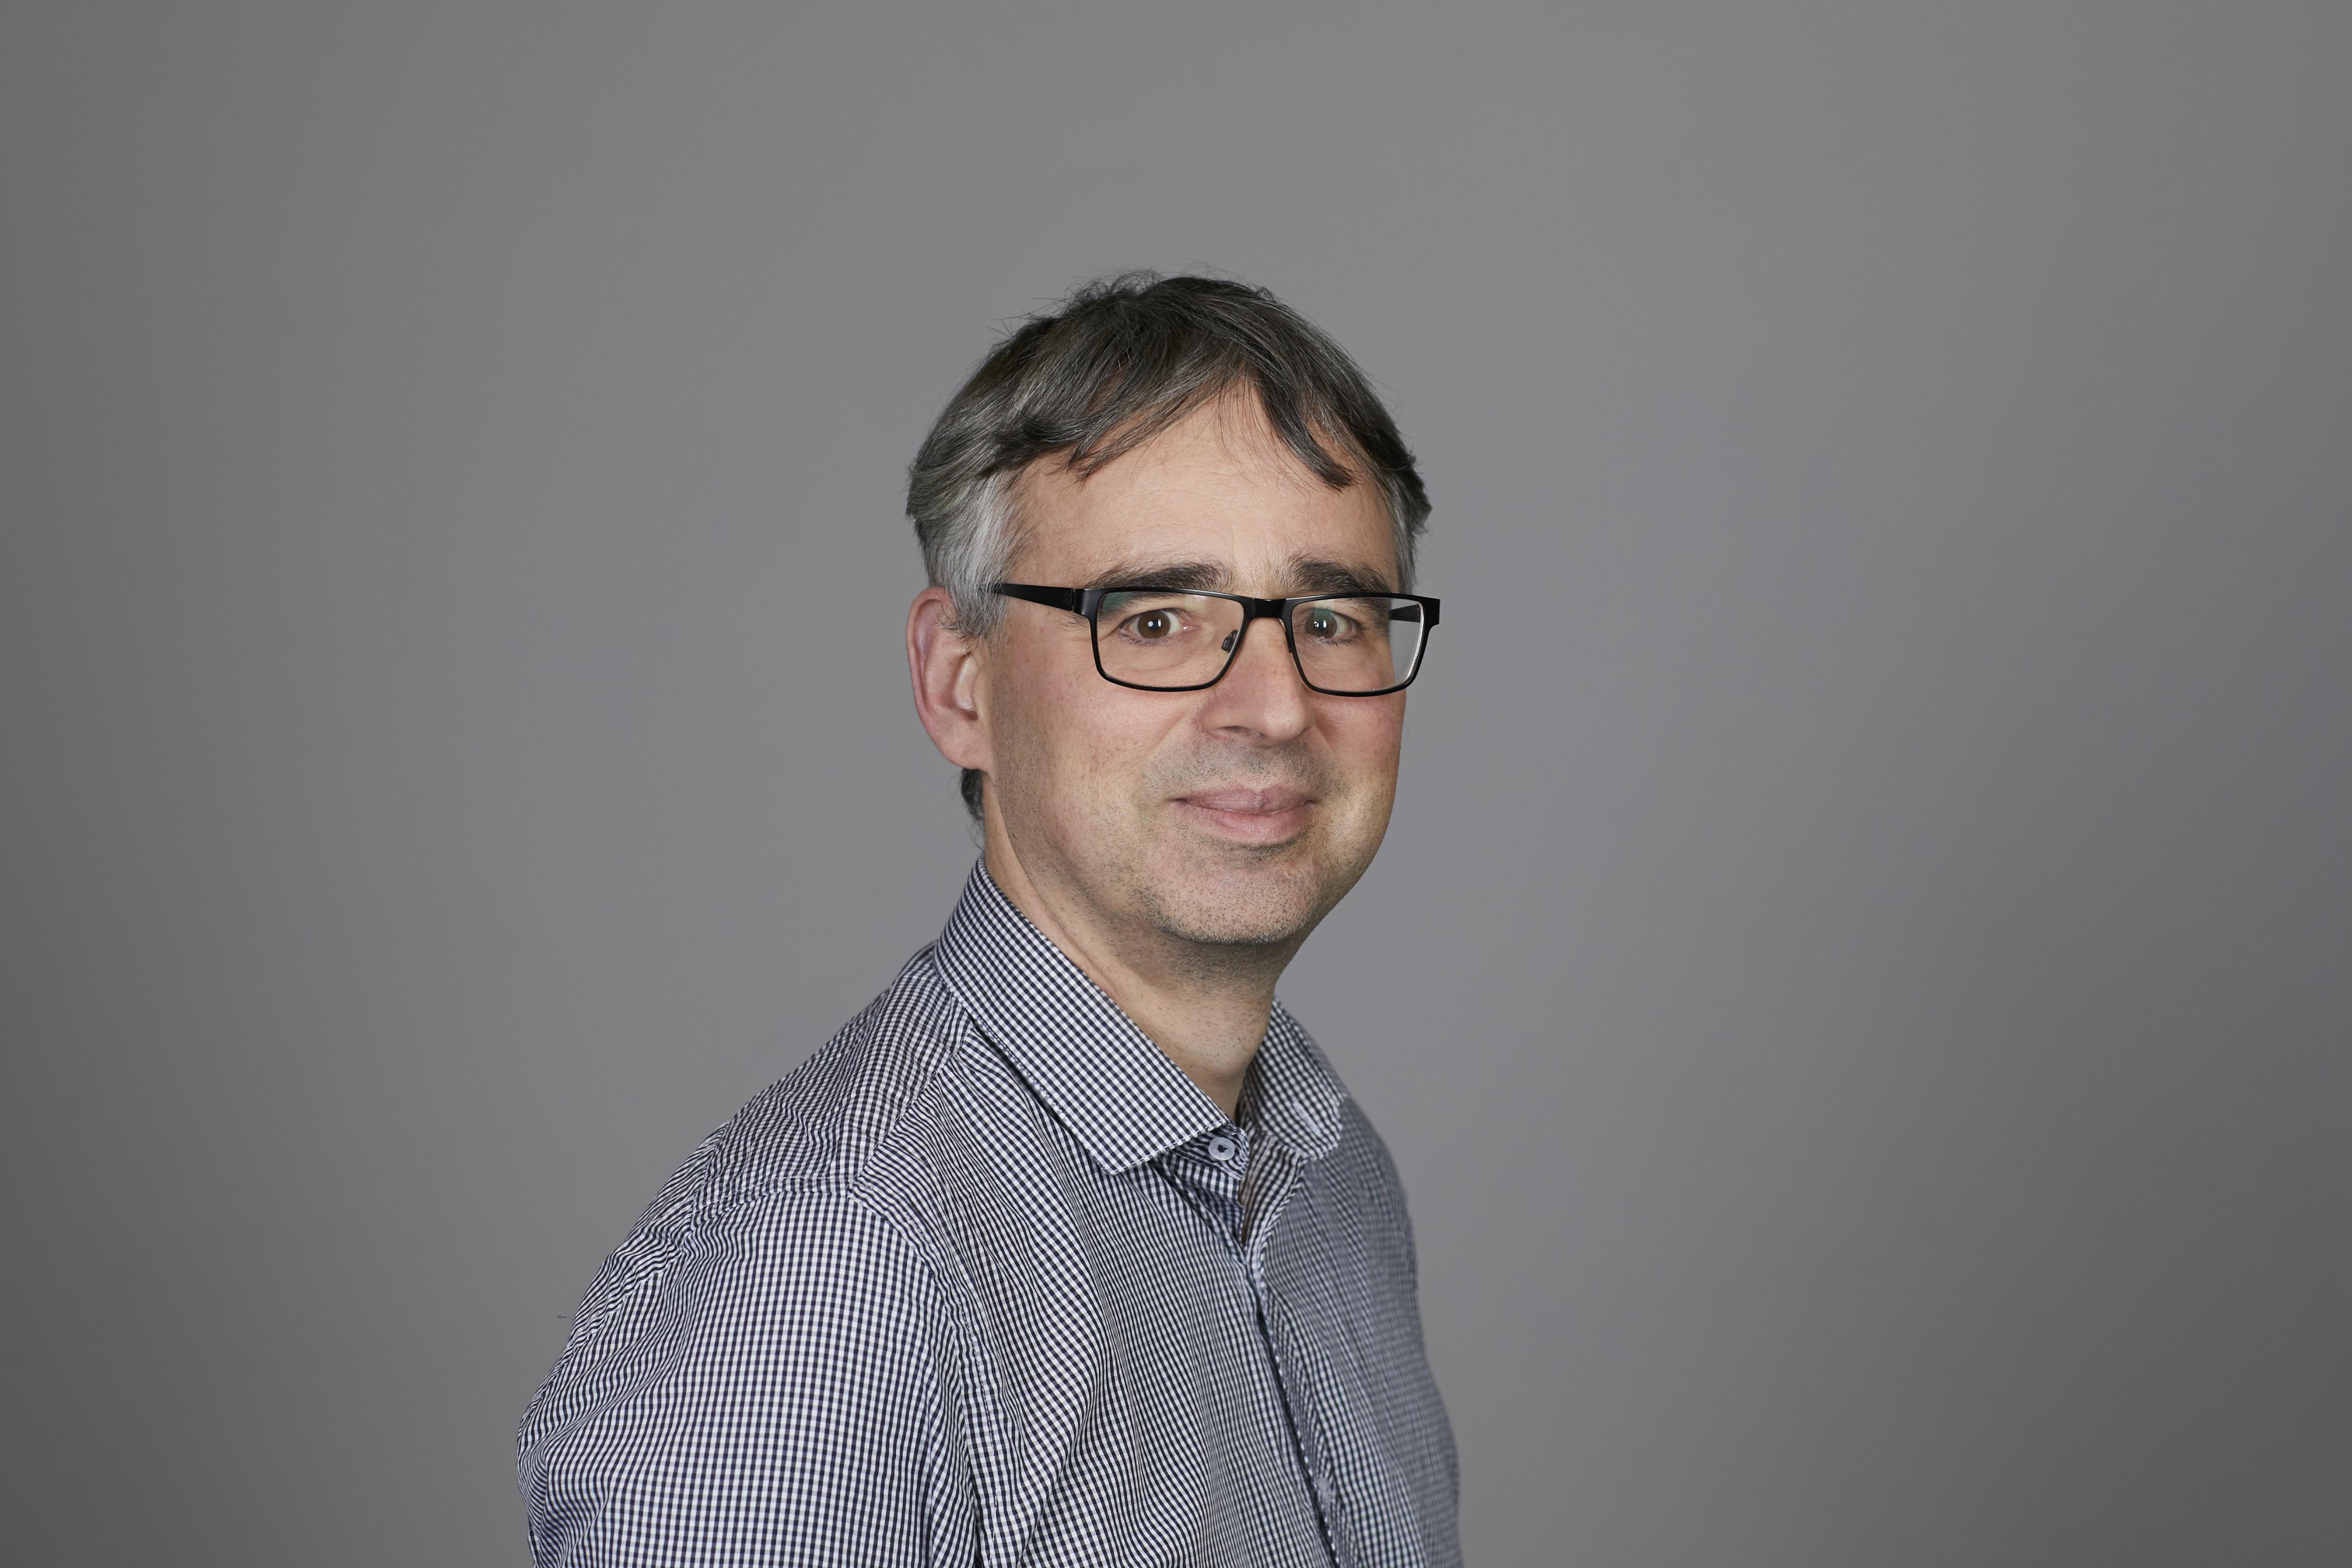 Daniel te Winkel